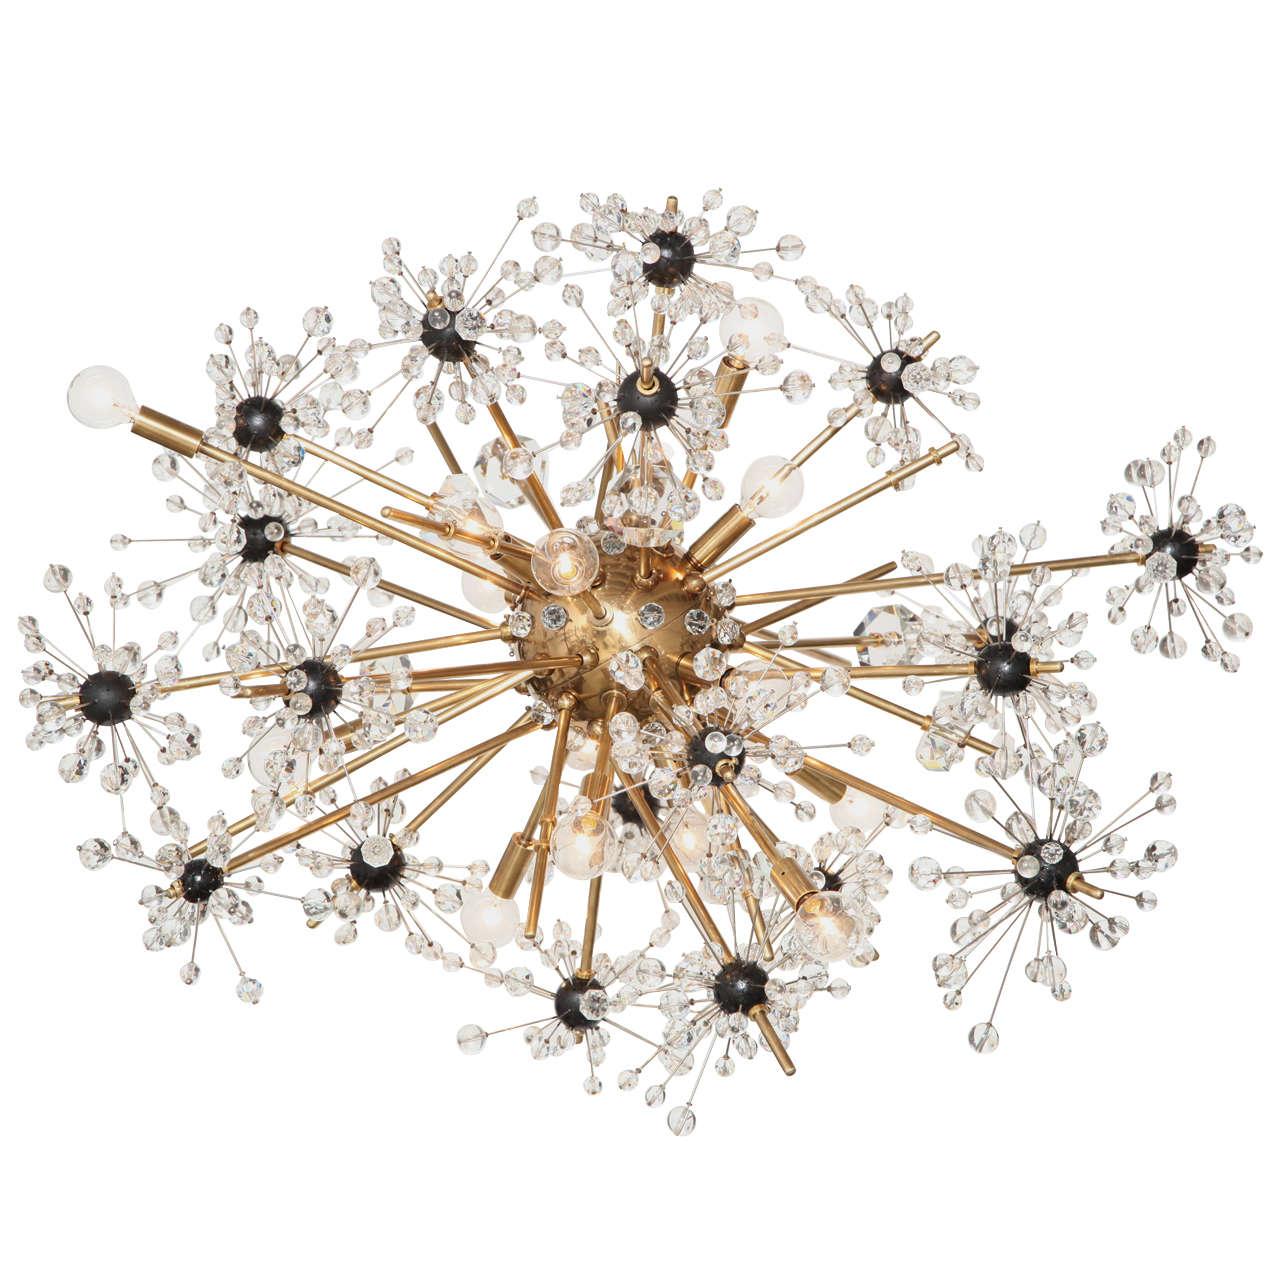 16 light lobmeyr metropolitan chandelier at 1stdibs arubaitofo Gallery